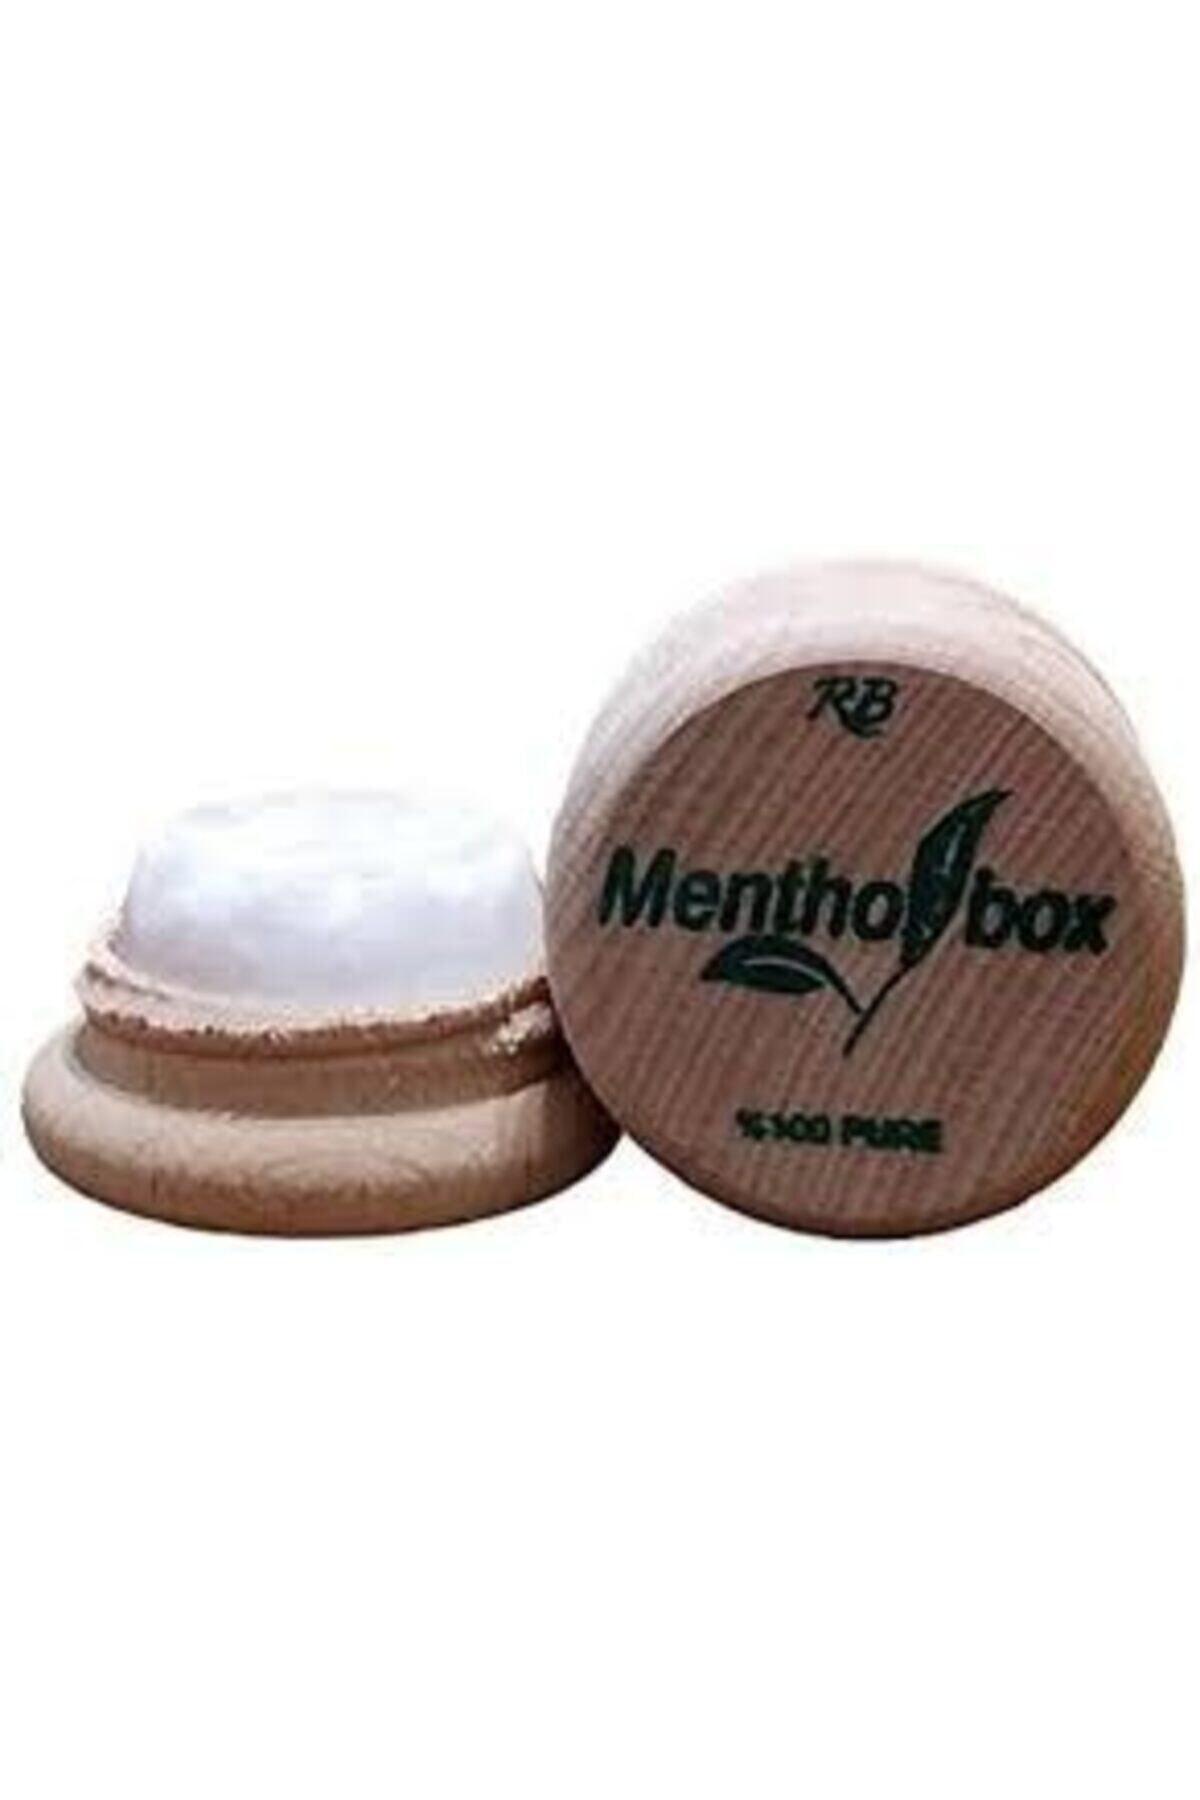 Doğa 2 Adet Mentholbox Menthol Yeni Tarihli 1